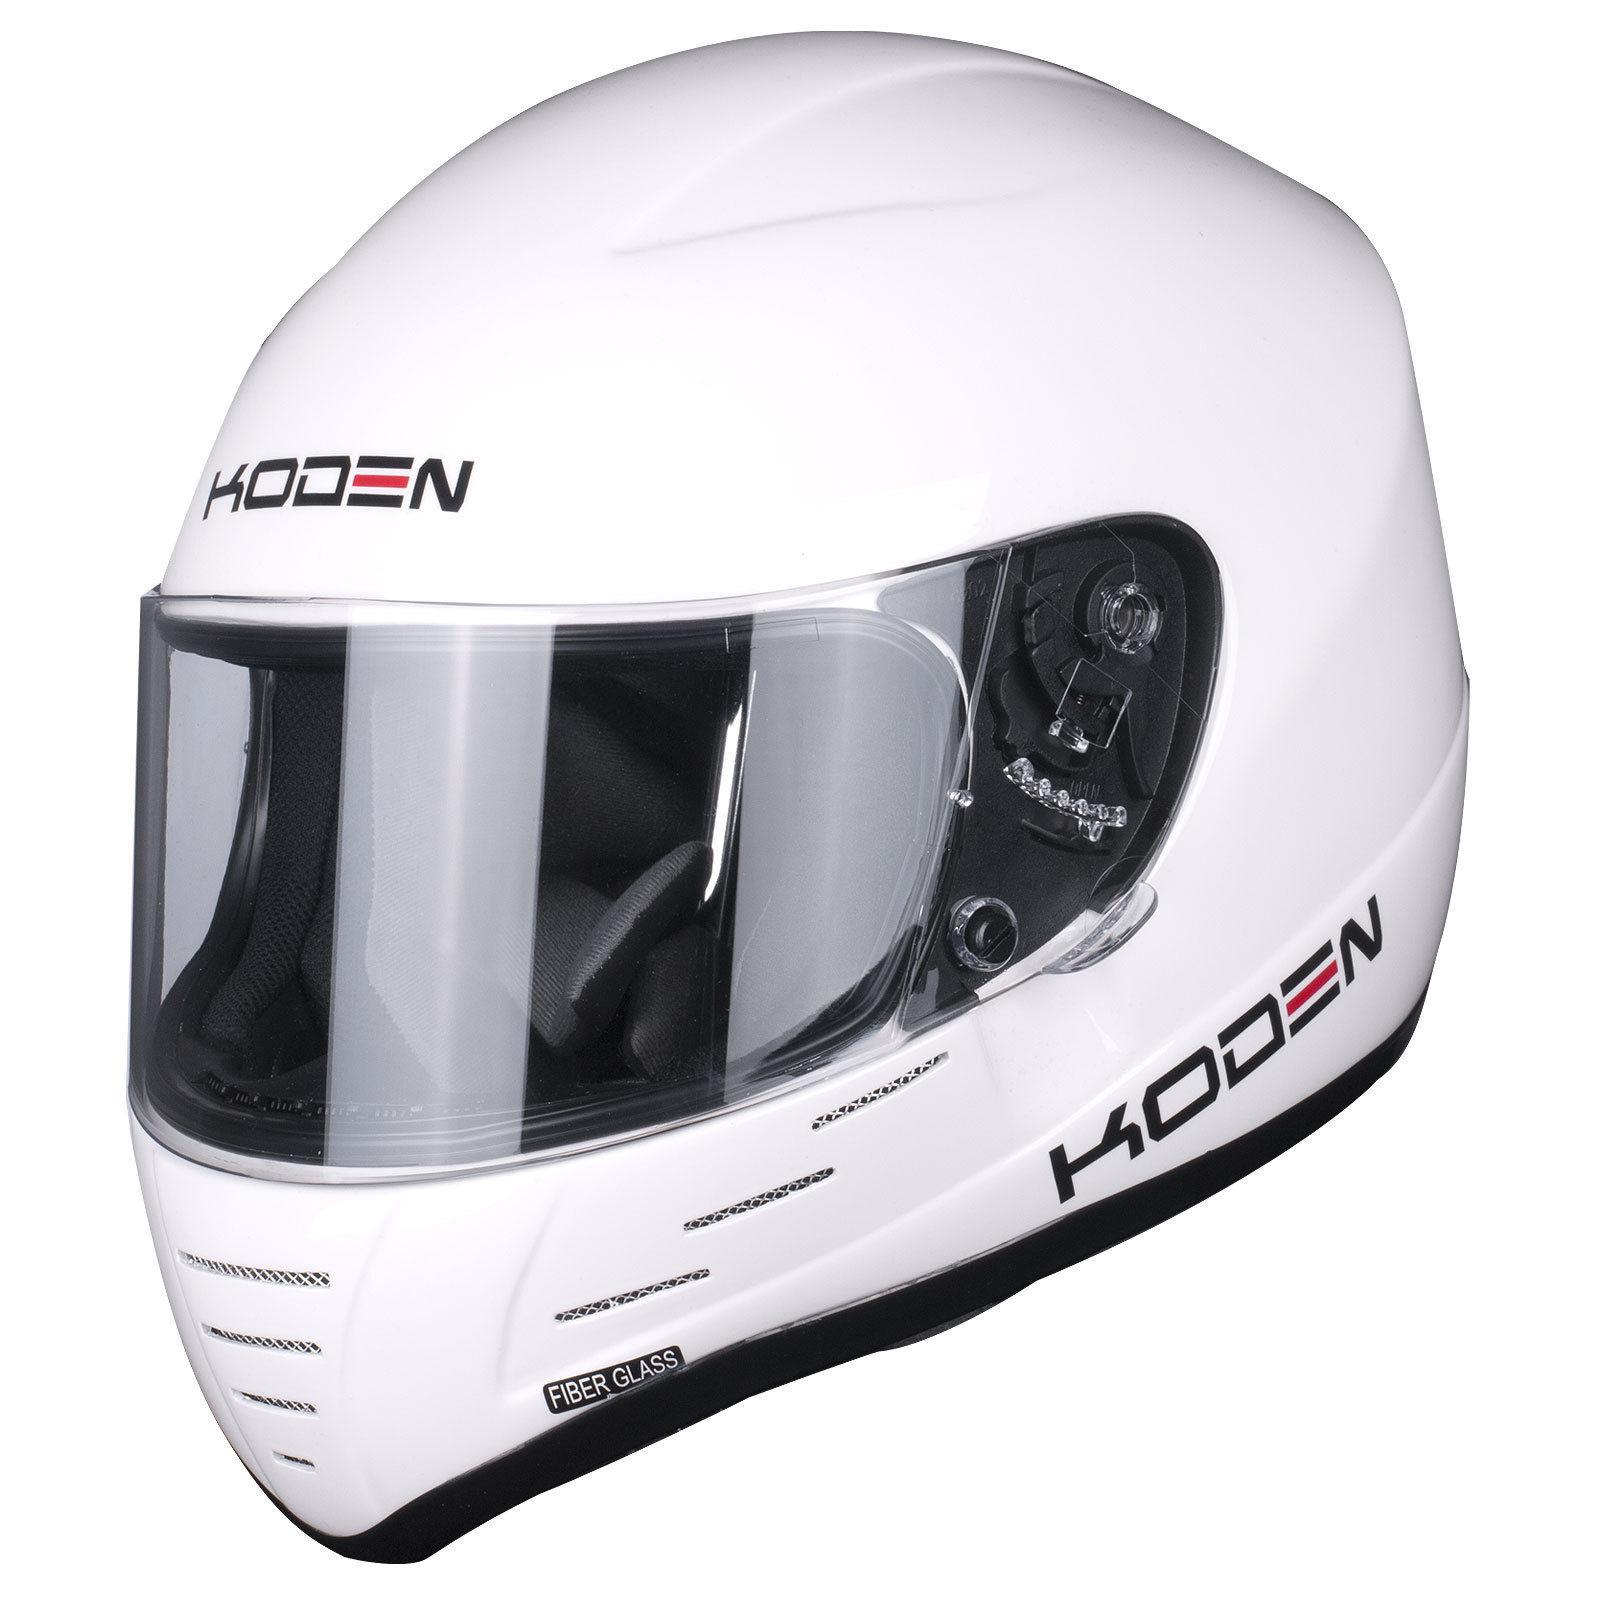 Sparco Club X1 Helmet >> Koden Kart K2010 Race Track Racing Crash Helmet Gloss Black Matt Black White | eBay